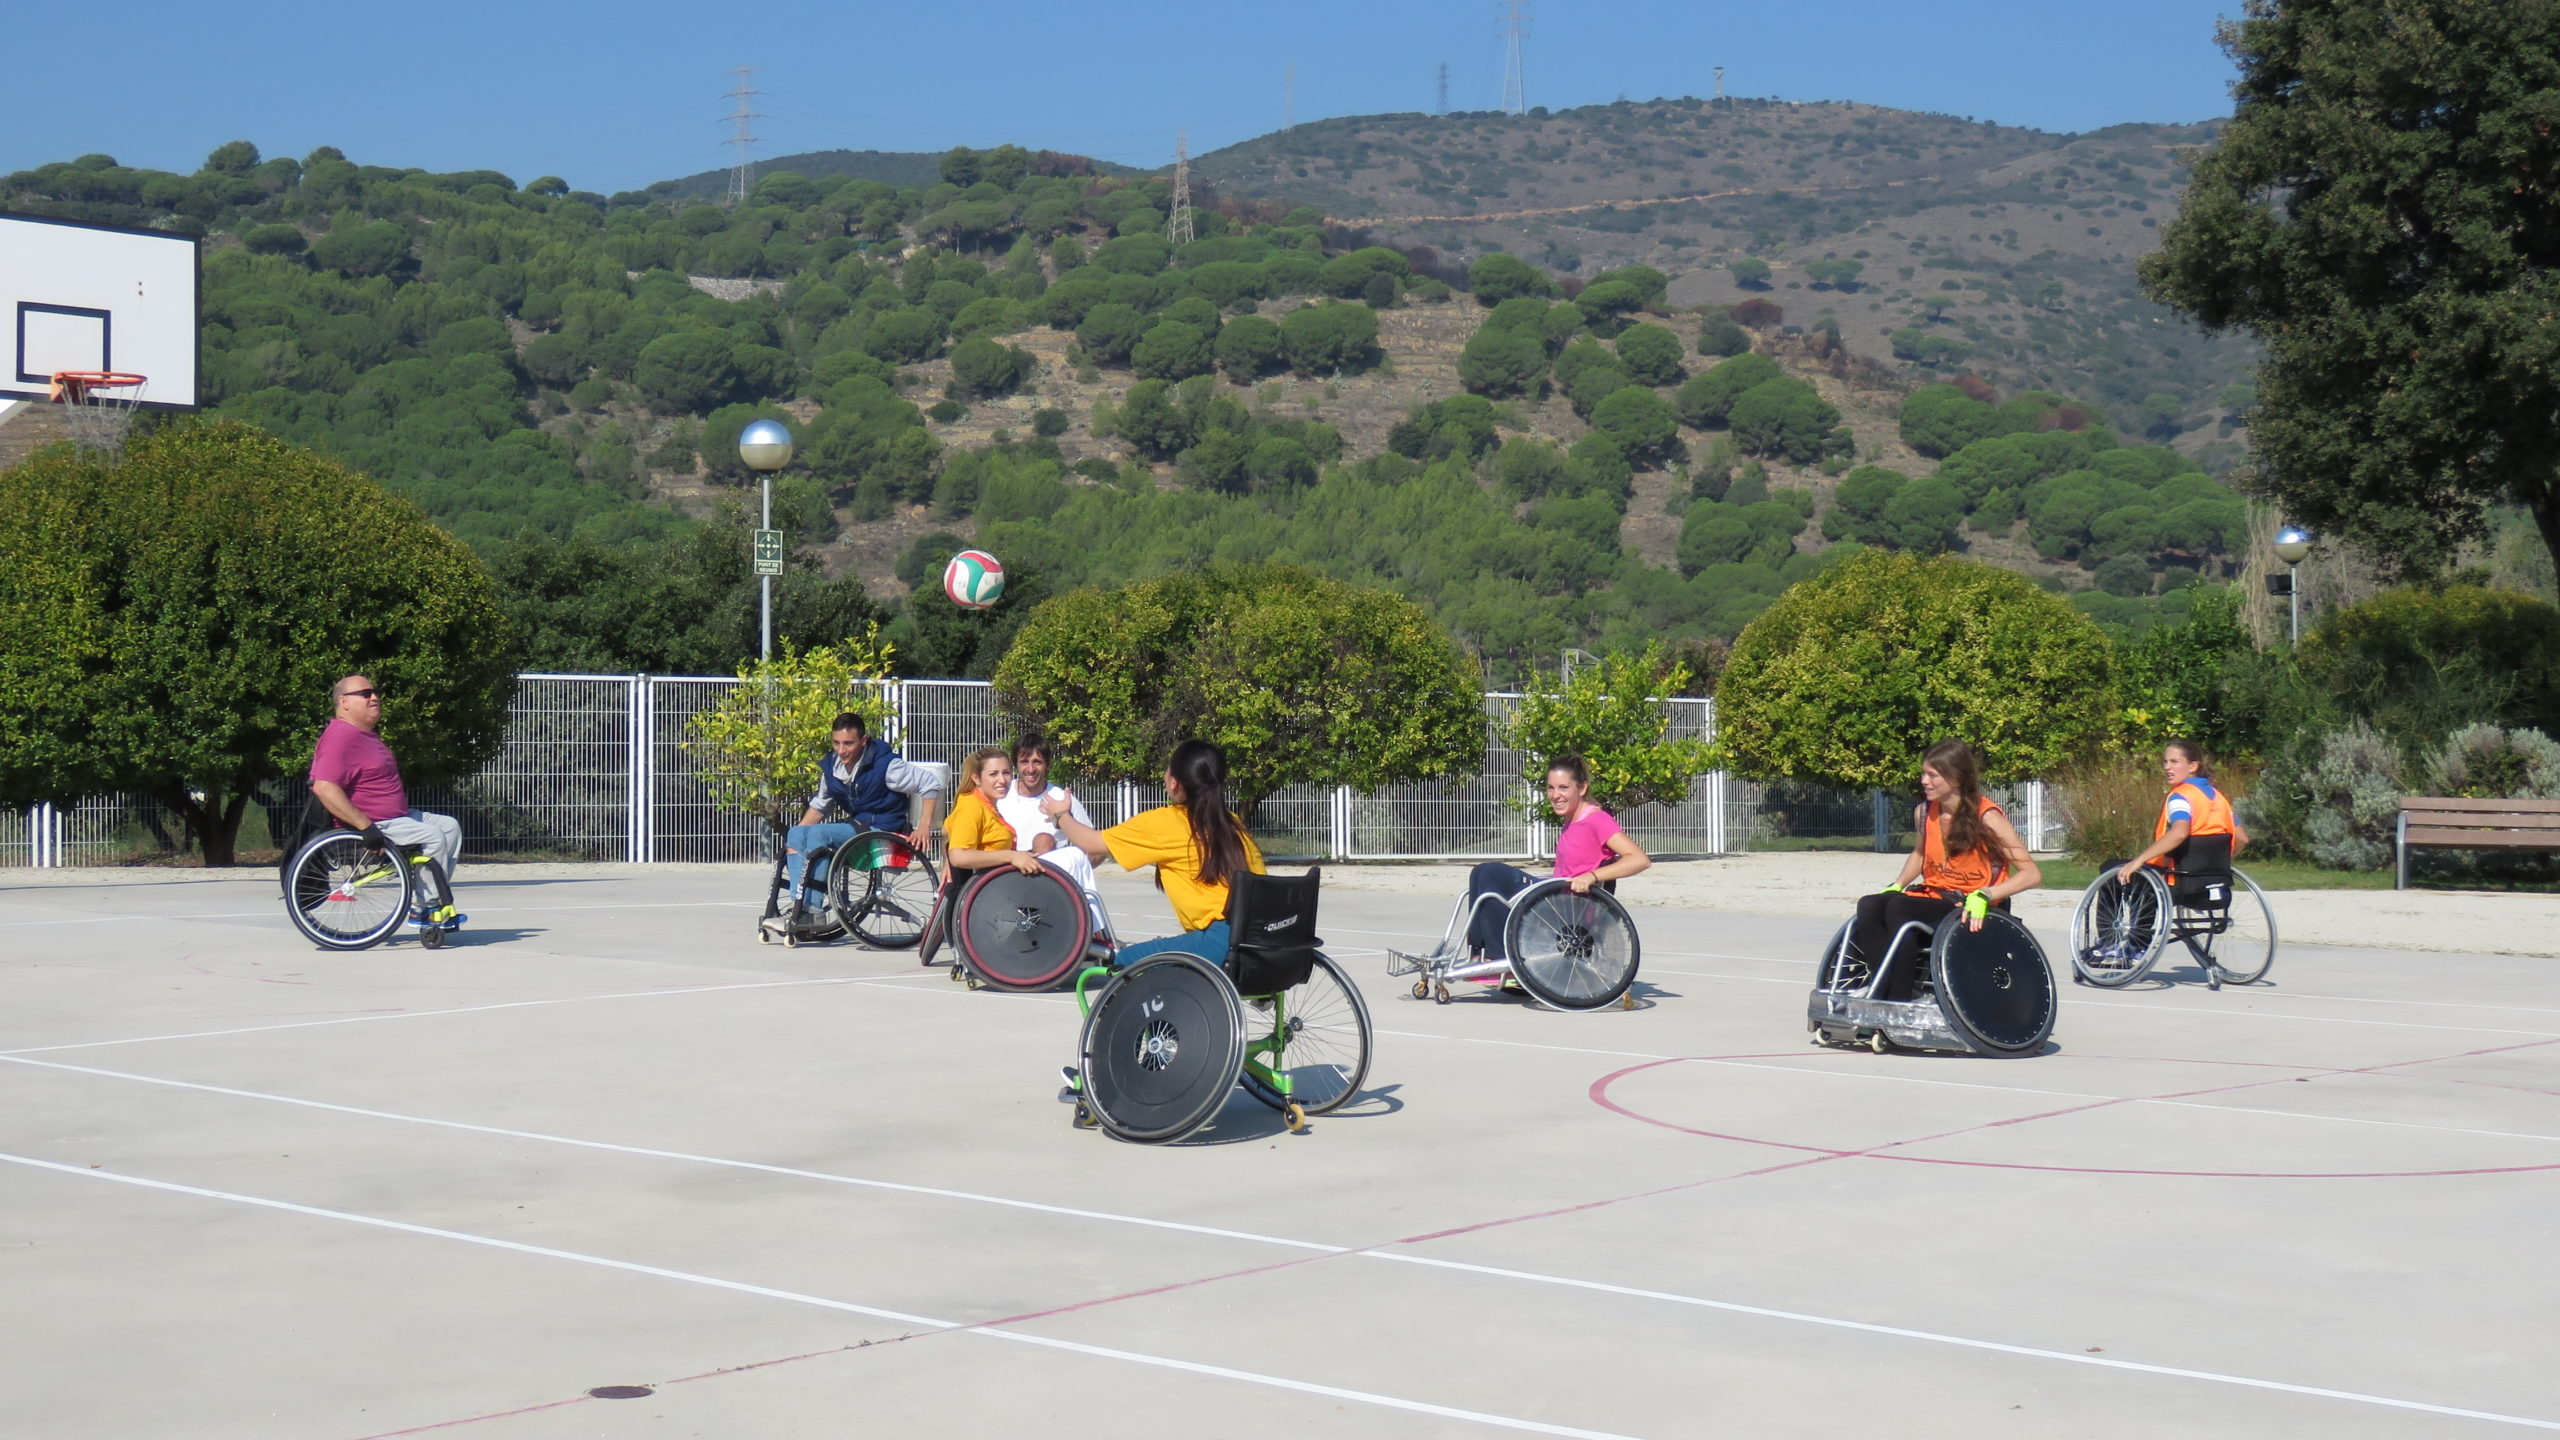 Com fer que un esport sigui inclusiu?